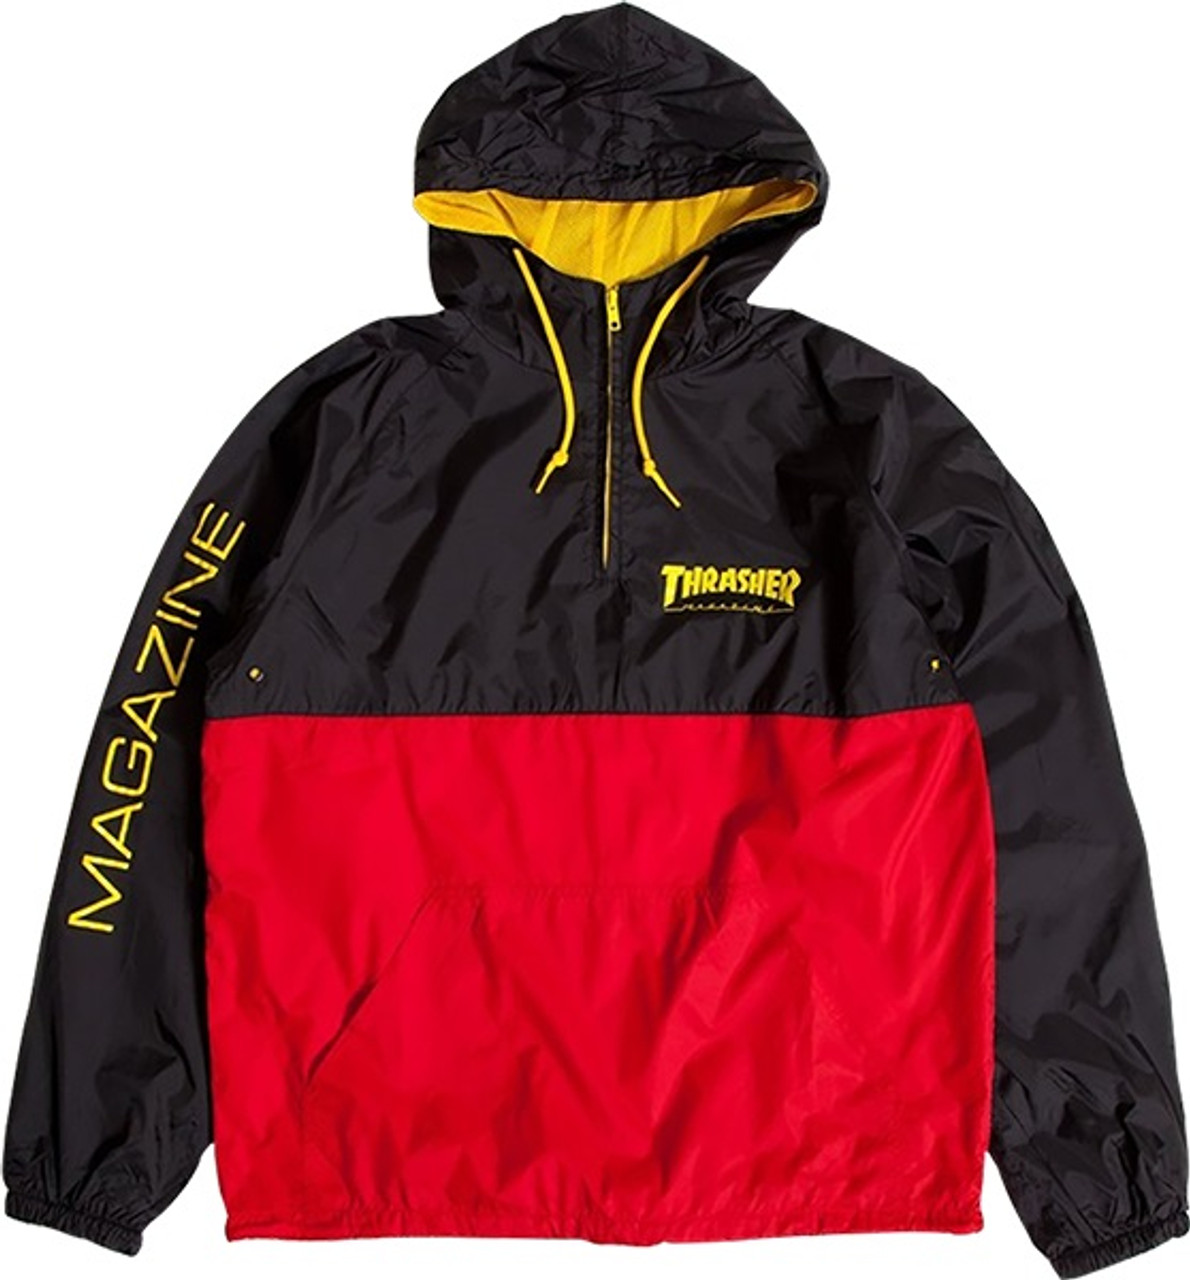 Thrasher Mag Logo Hooded Anorak Jacket Black Red Yellow